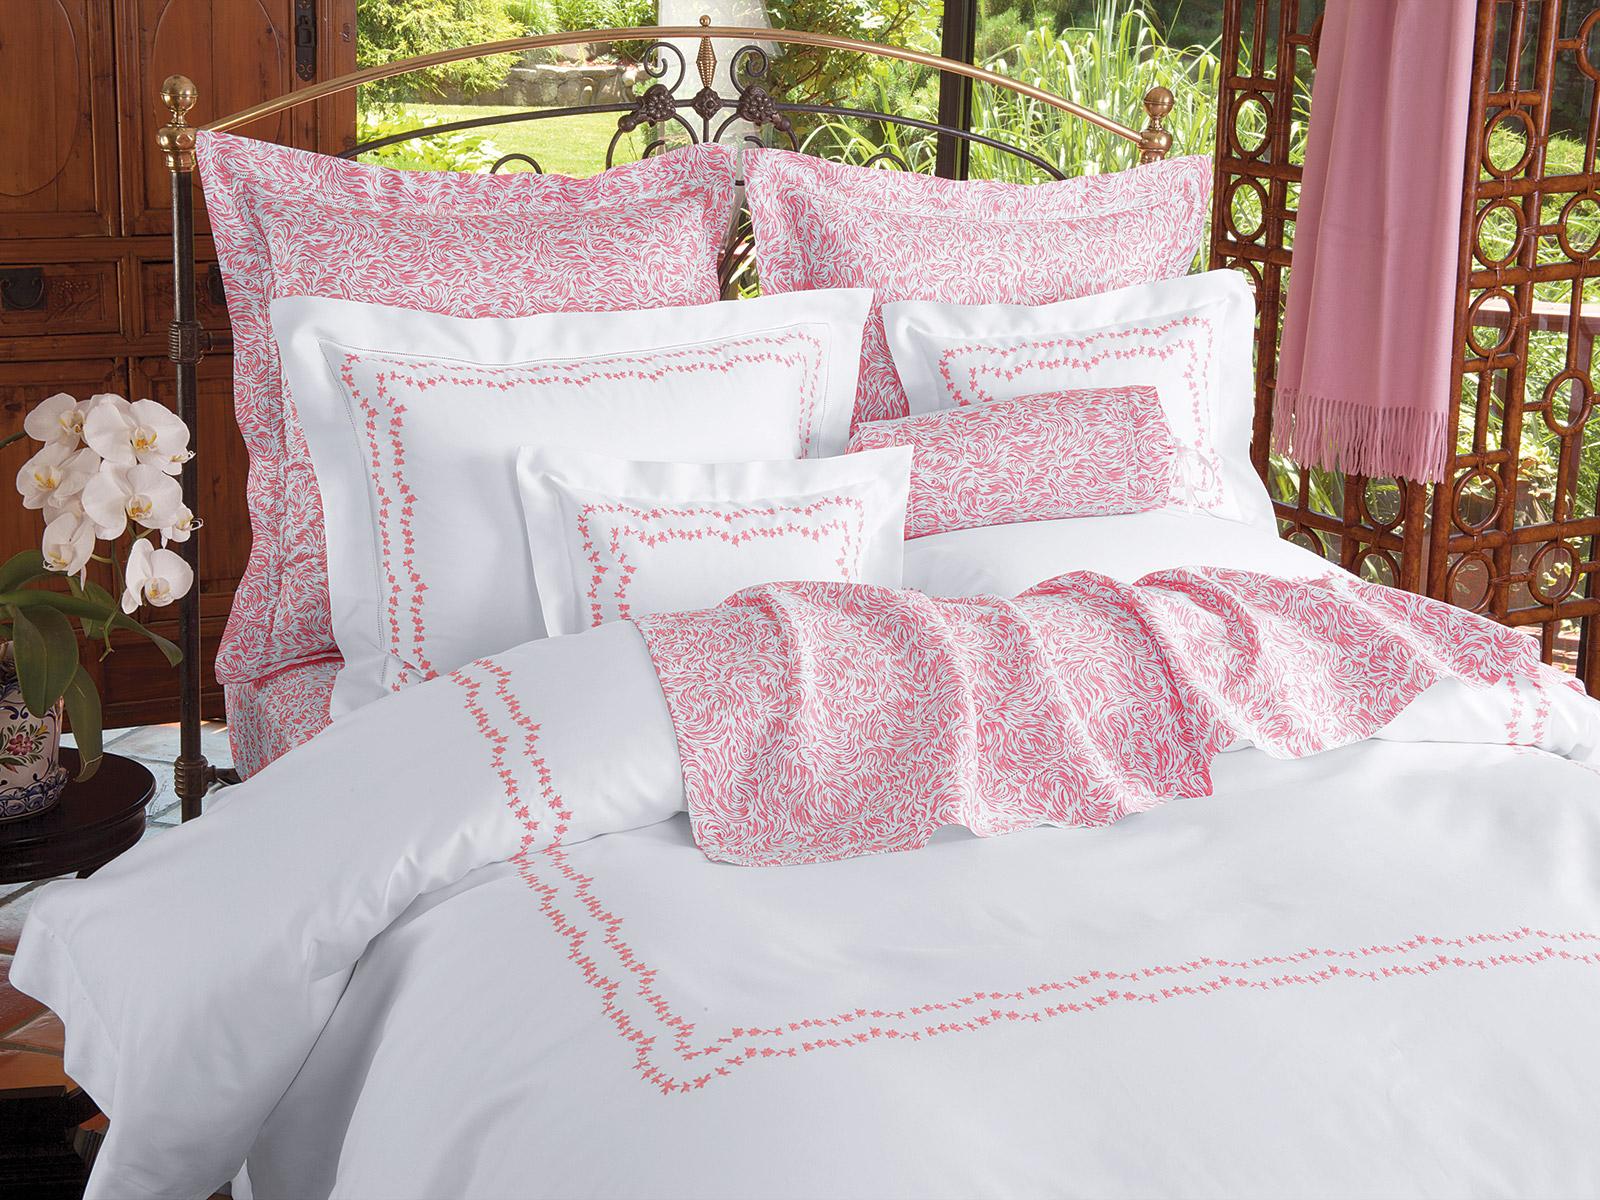 Pure White Linen Breeze White Linen For Women 3 4 Oz Body